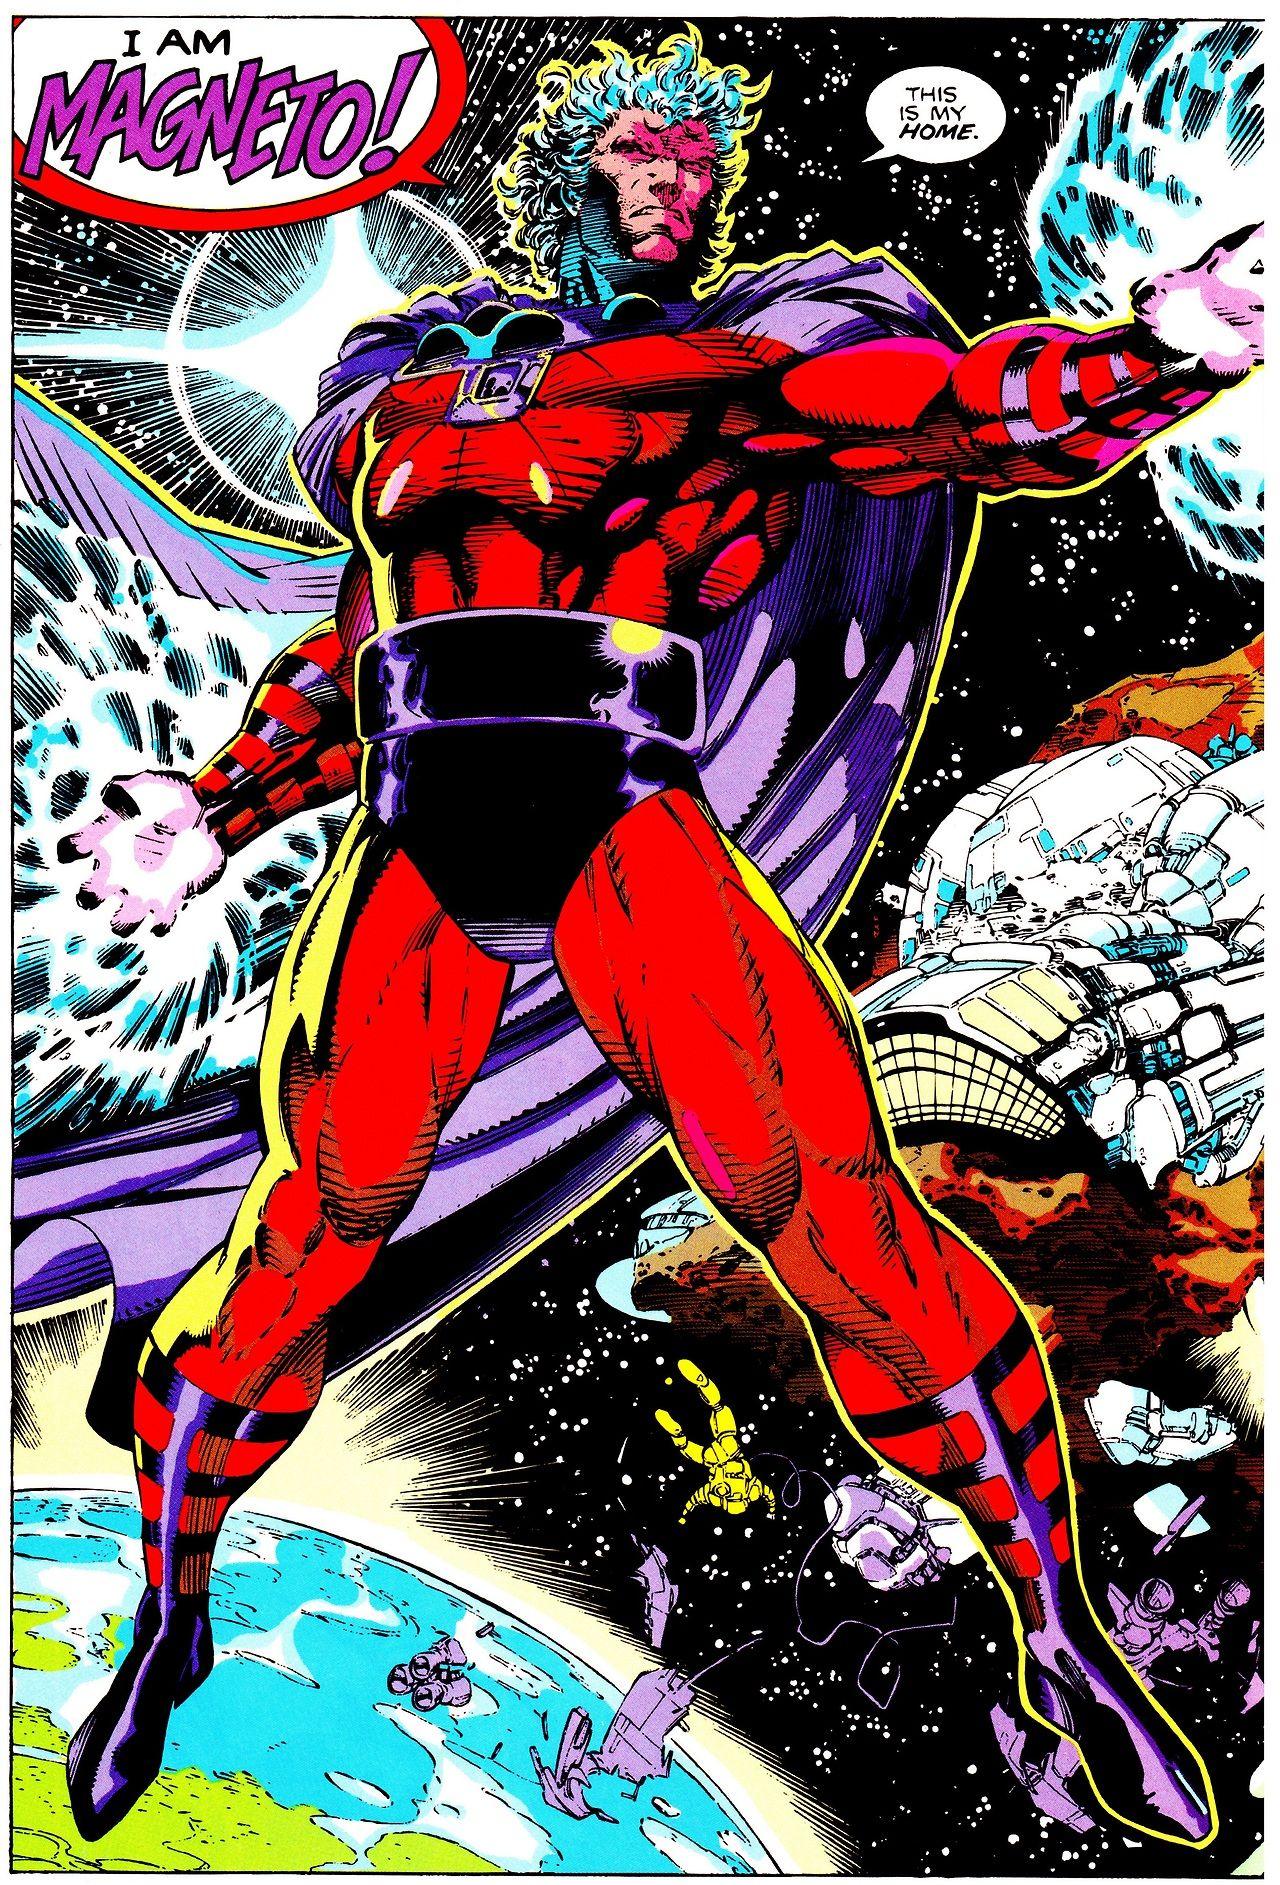 Magneto At Asteroid M X Men Vol 2 1 Oct 1991 Art By Jim Lee Pencils Scott Williams Inks Joe Rosa Marvel Comics Superheroes Marvel Villains Jim Lee